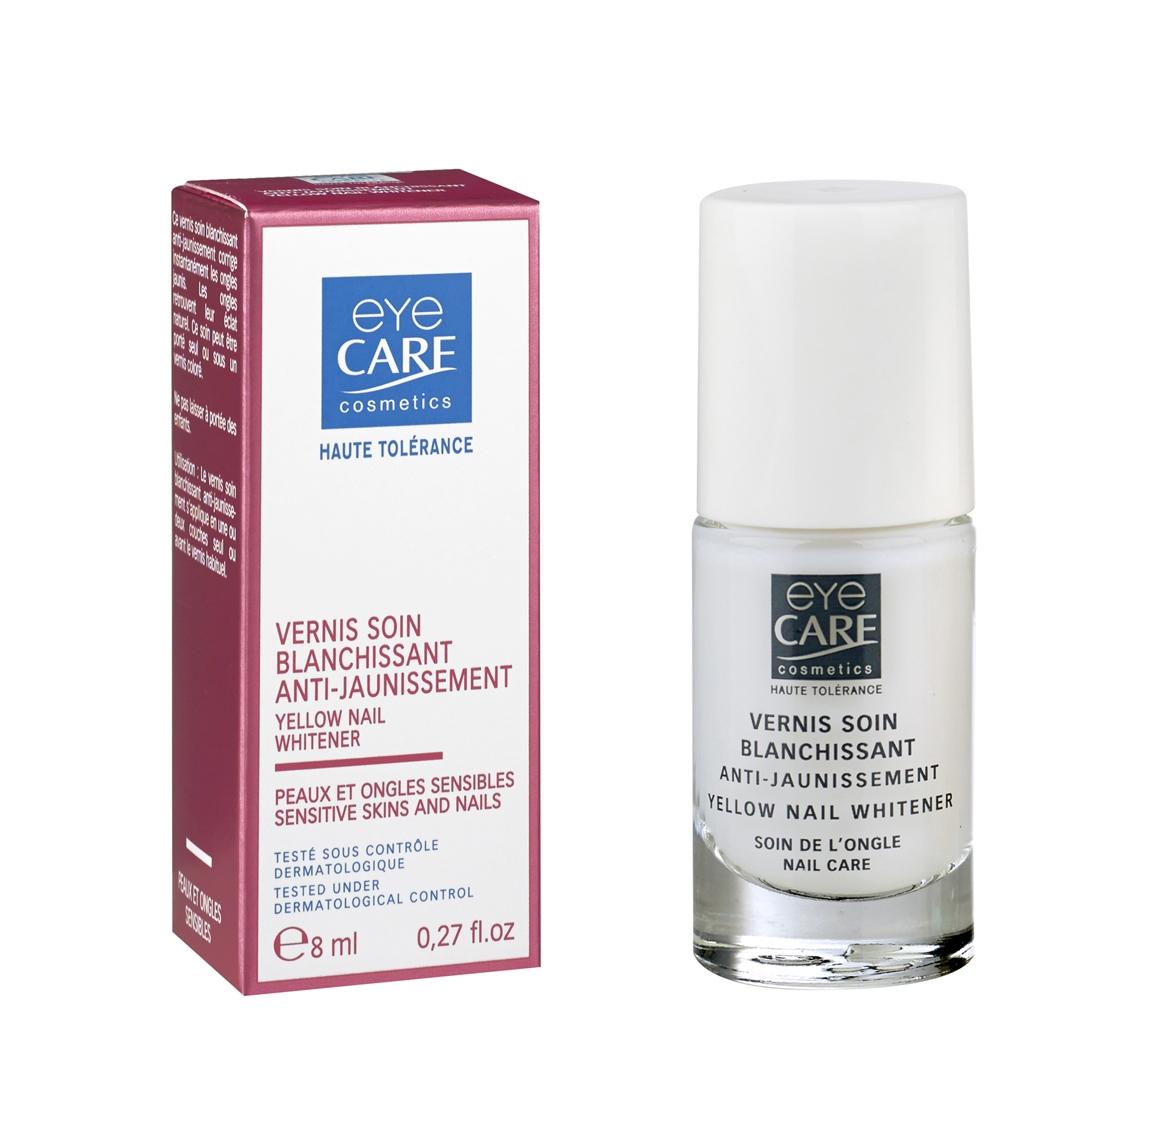 Vernis soin anti-jaunissement, ongles abîmés cancer, Eye Care Cosmetics